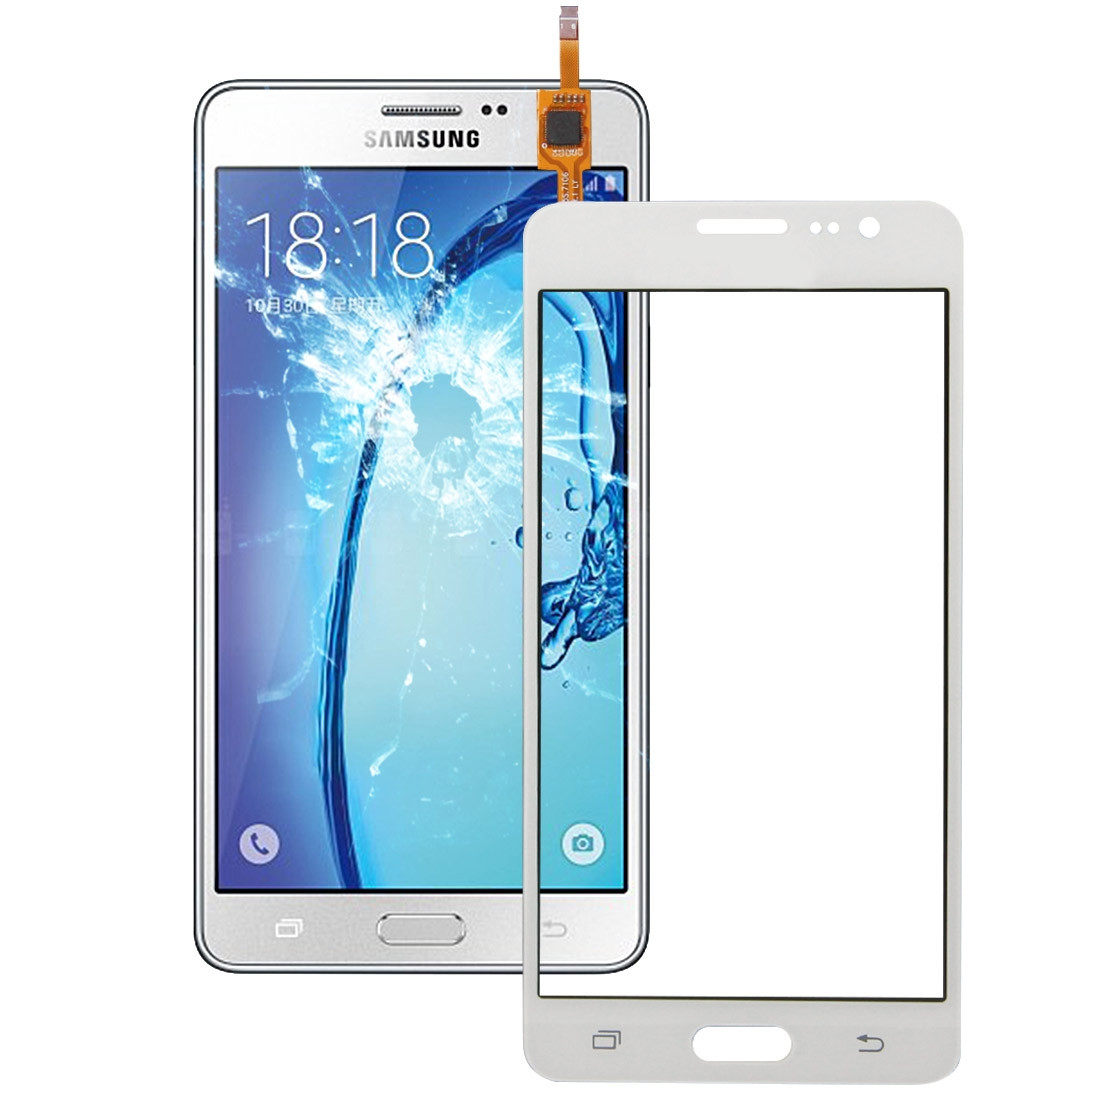 IPartsBuy Ecran Tactile Pour Samsung Galaxy On5 G5500 Blanc SI04WL257 08